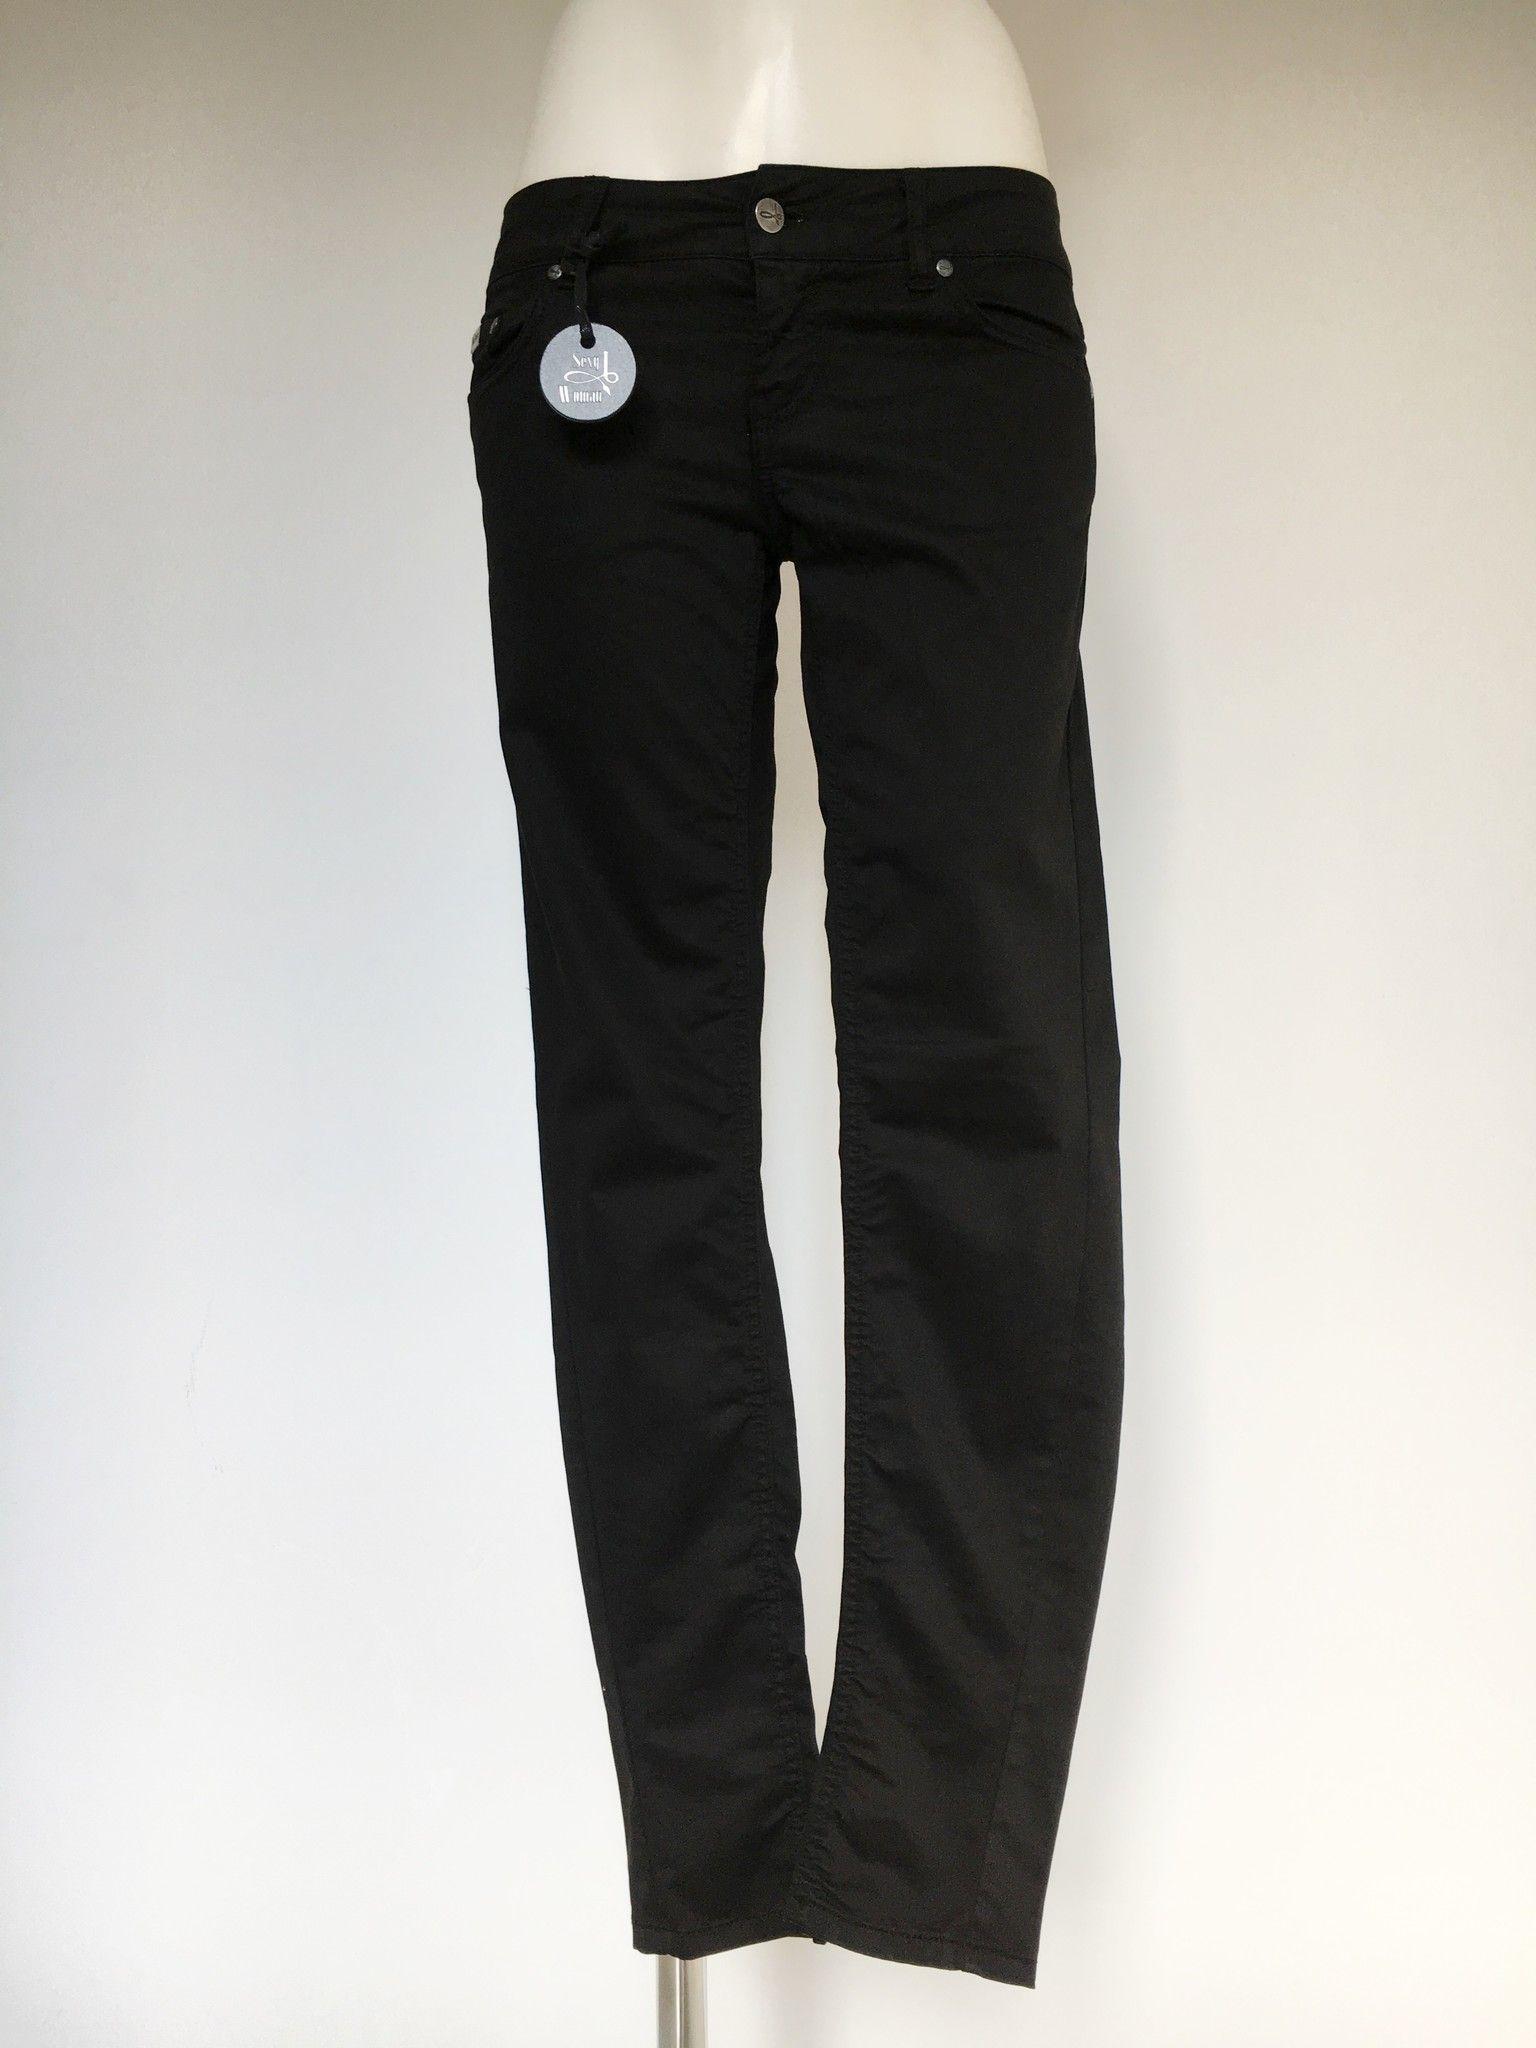 Jeans Sexy Woman Cinque Tasche Lungo Cod.5A29